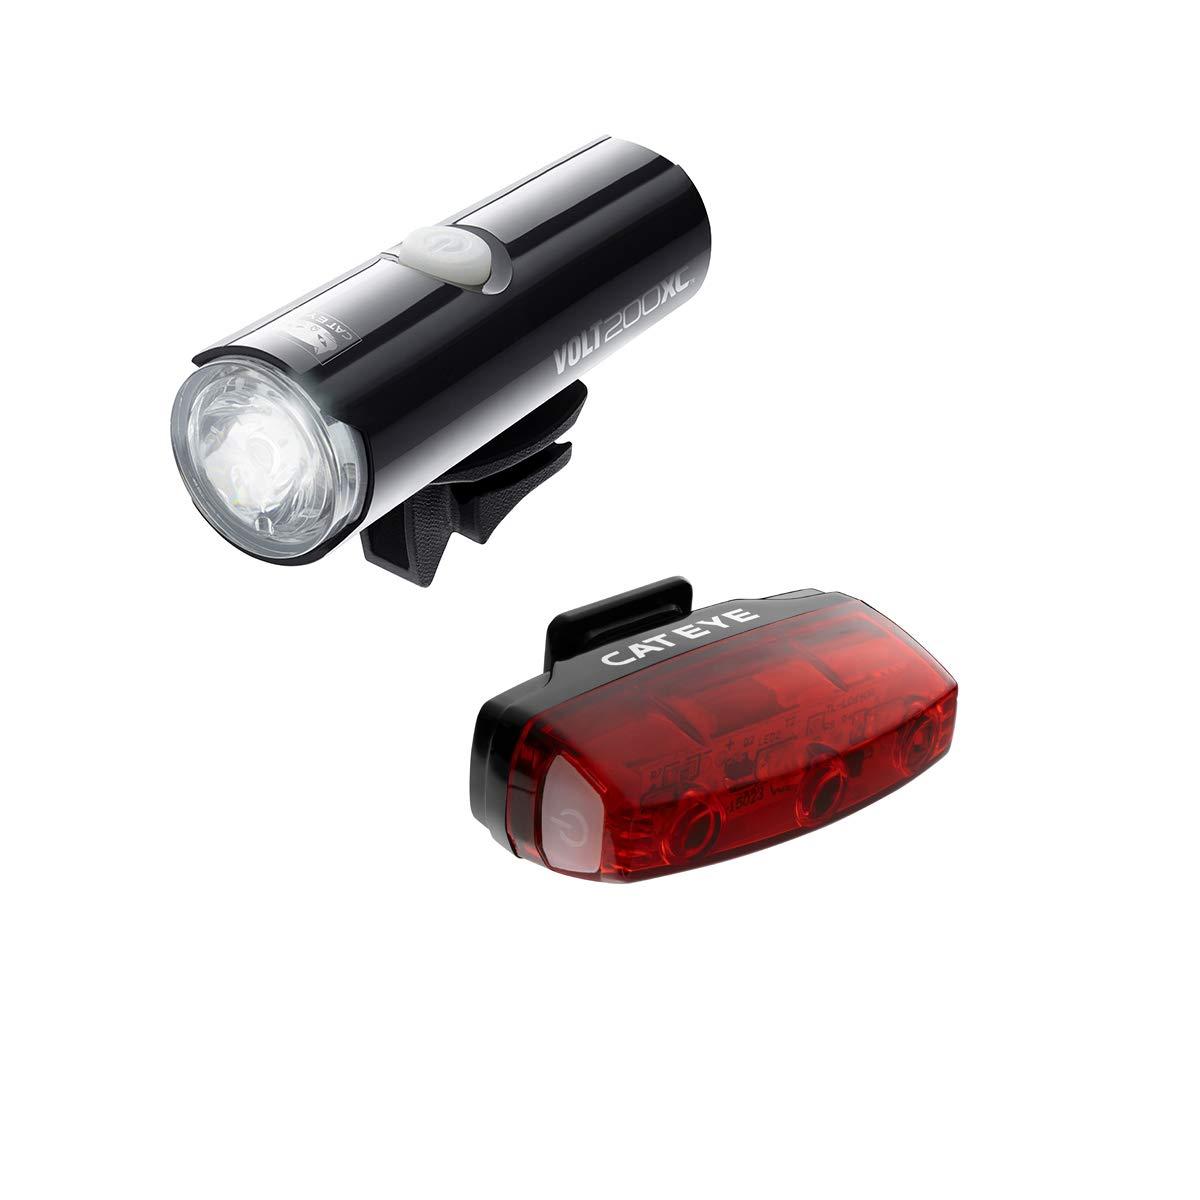 Cateye Volt 200 Xc/rapid Mini Rechargeable Light Set